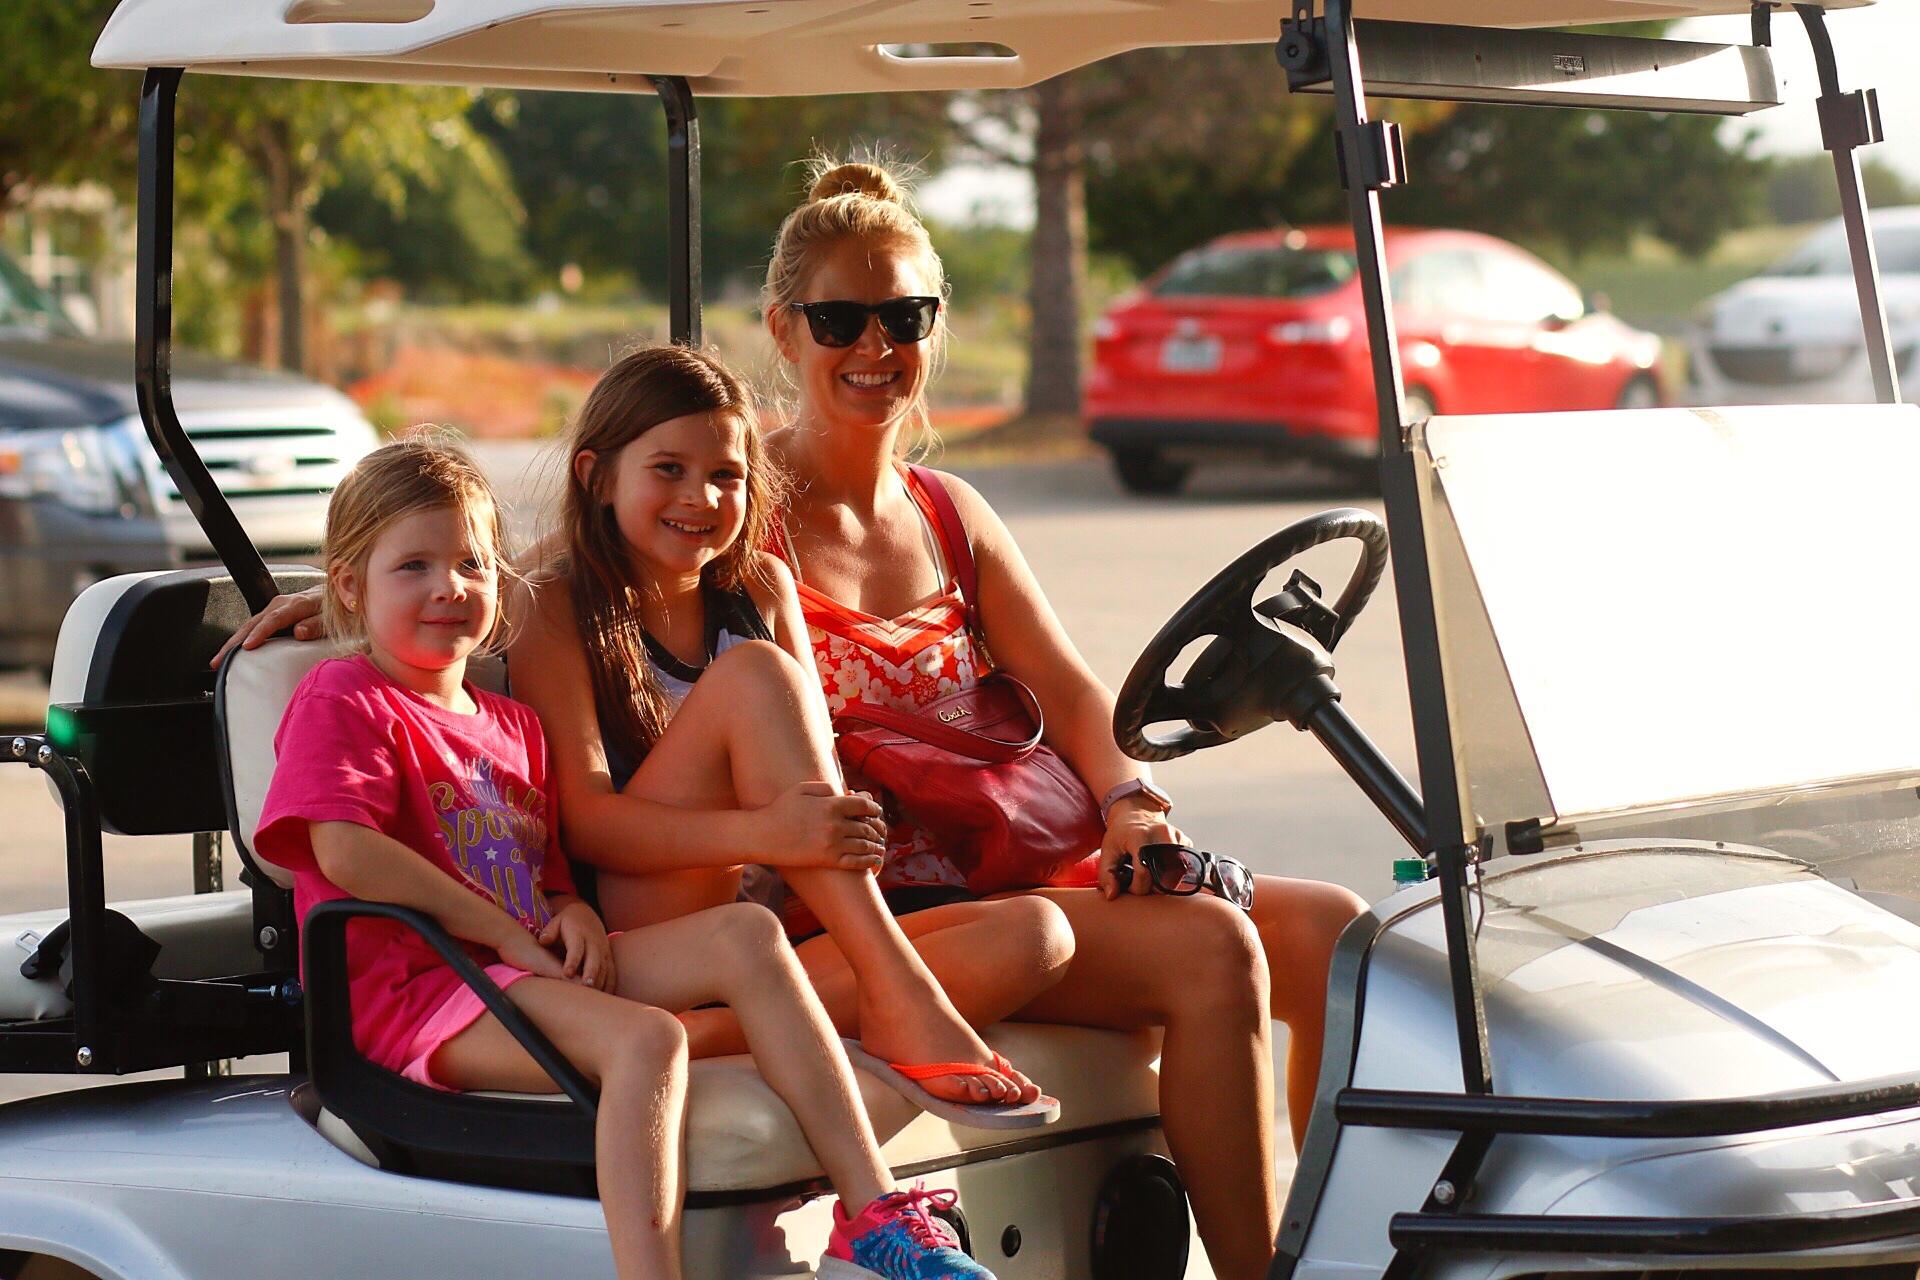 golf cart mckinney tx, recreational insurance, insurance for personal toys